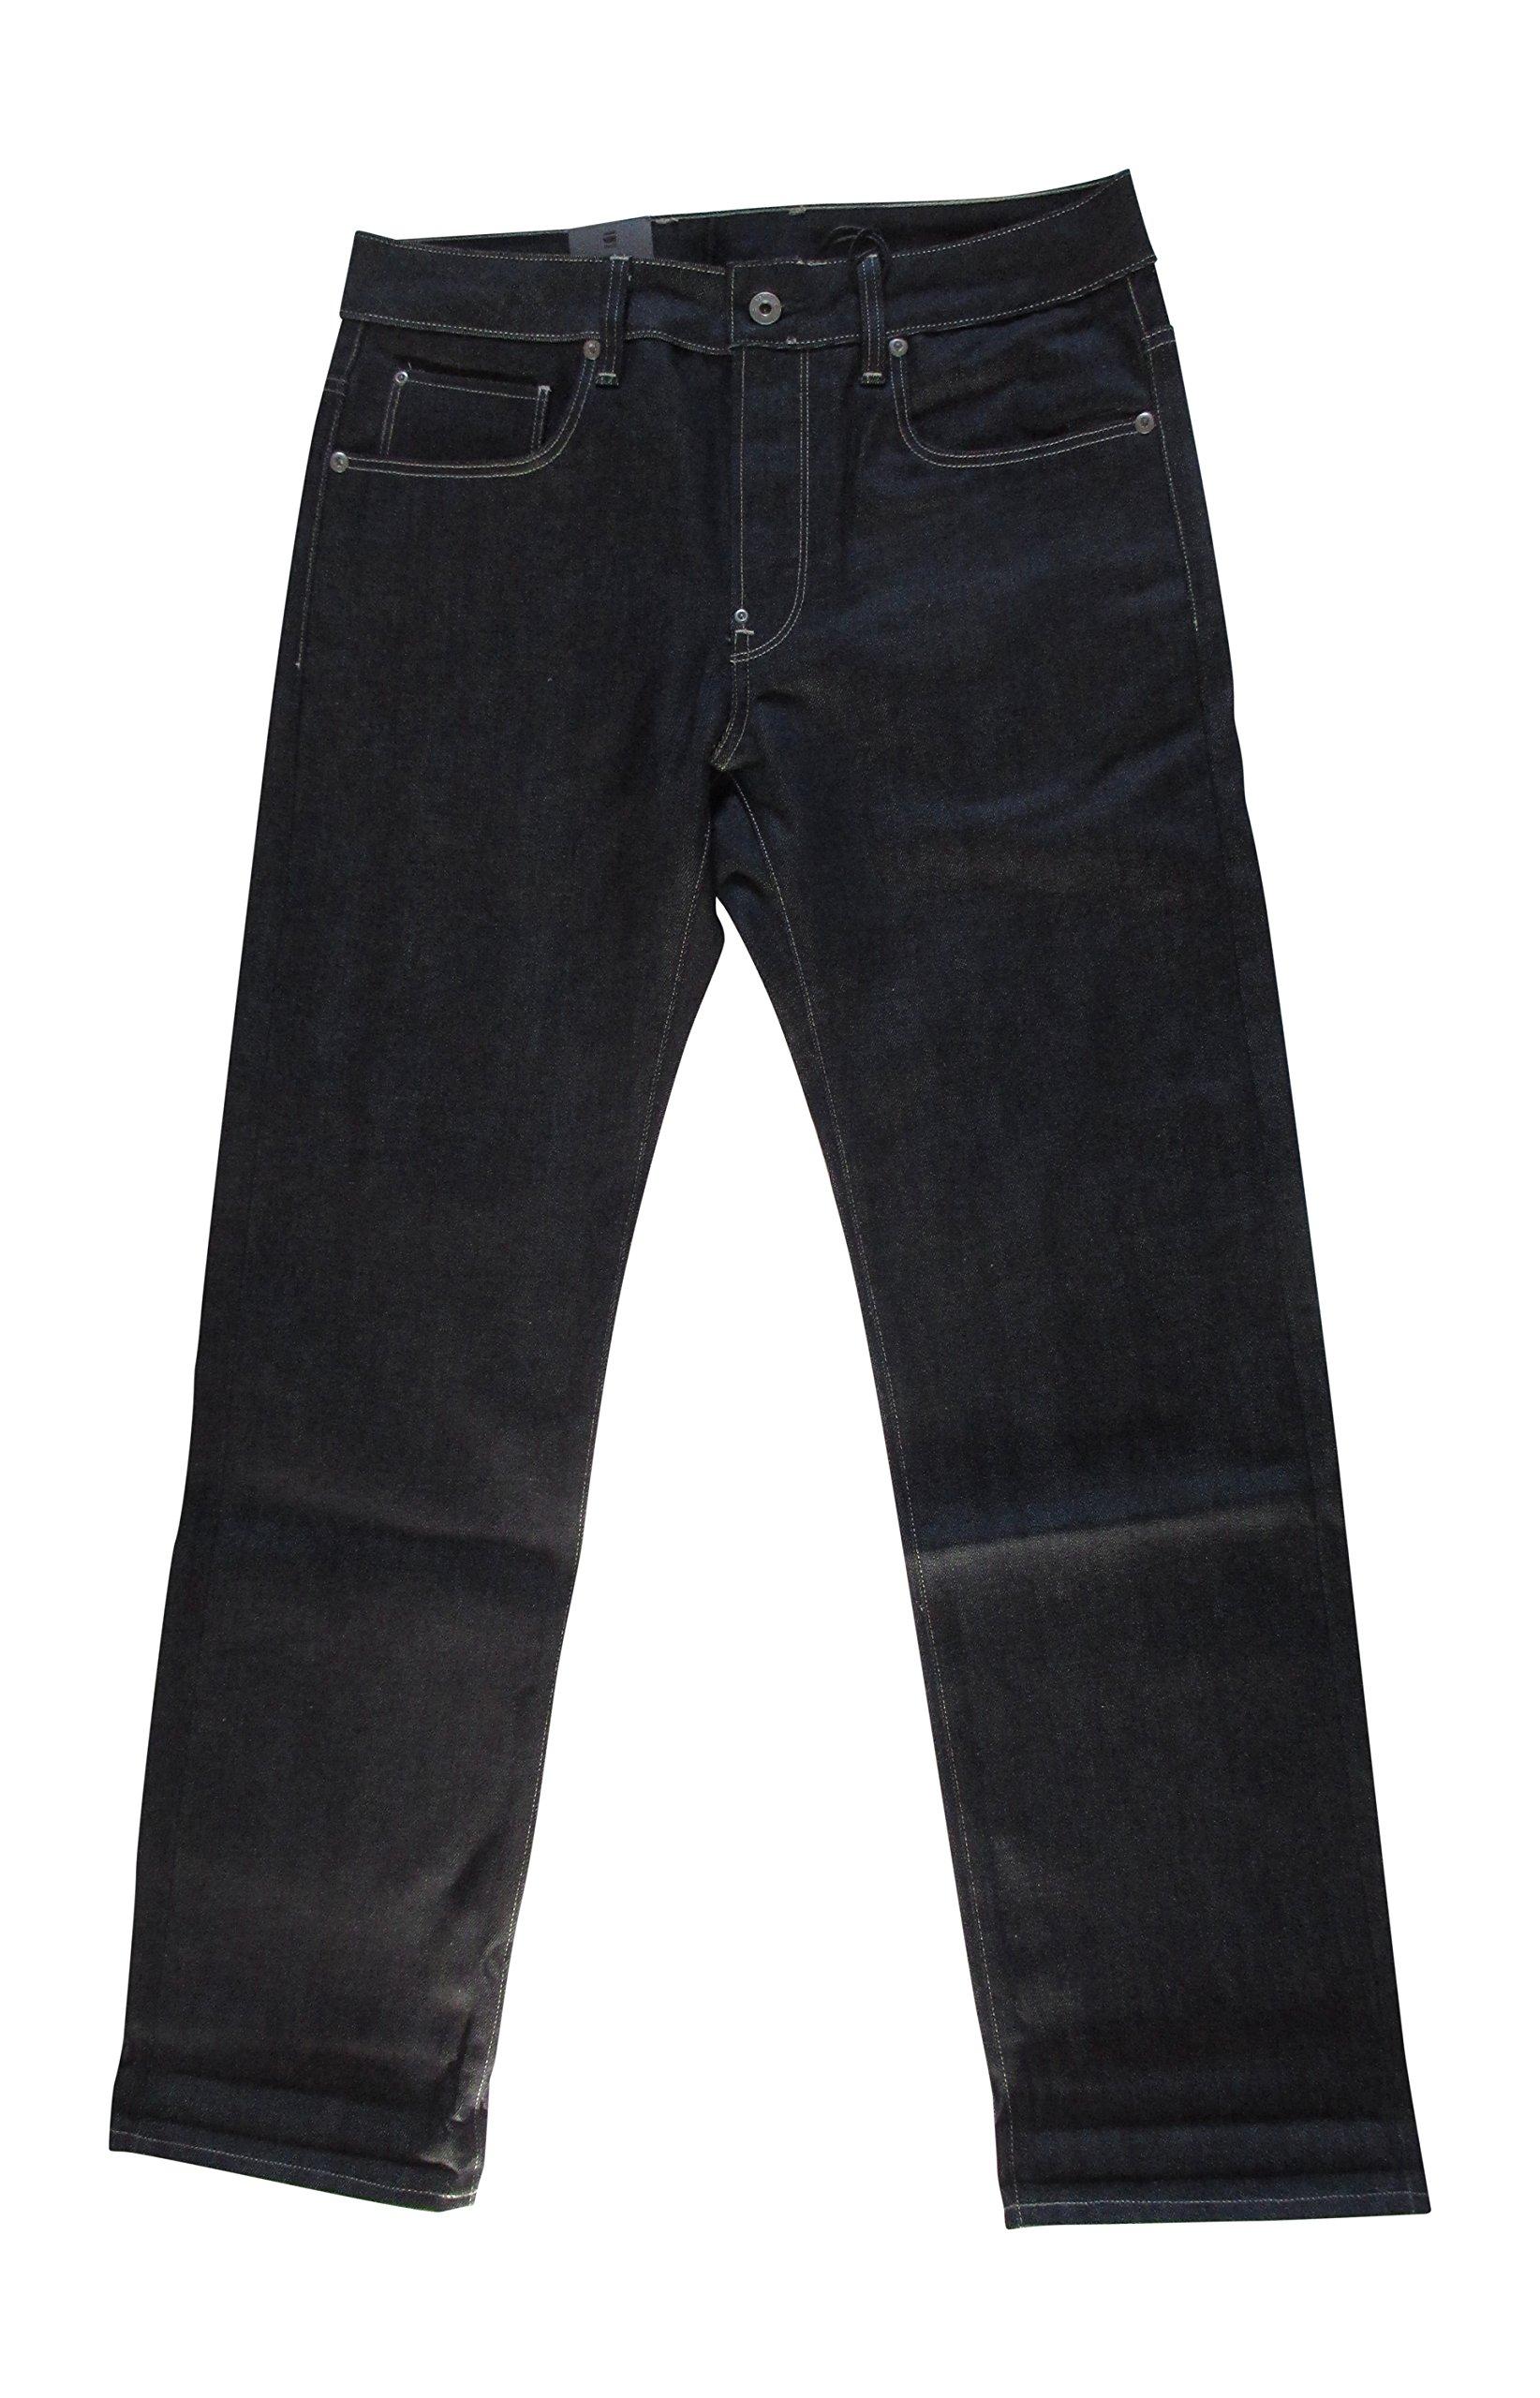 G-star Raw mens ATTACC straight mens jeans 51008 pants (waist 33 leg 30, RL selve denim rigid raw 7547.3253)